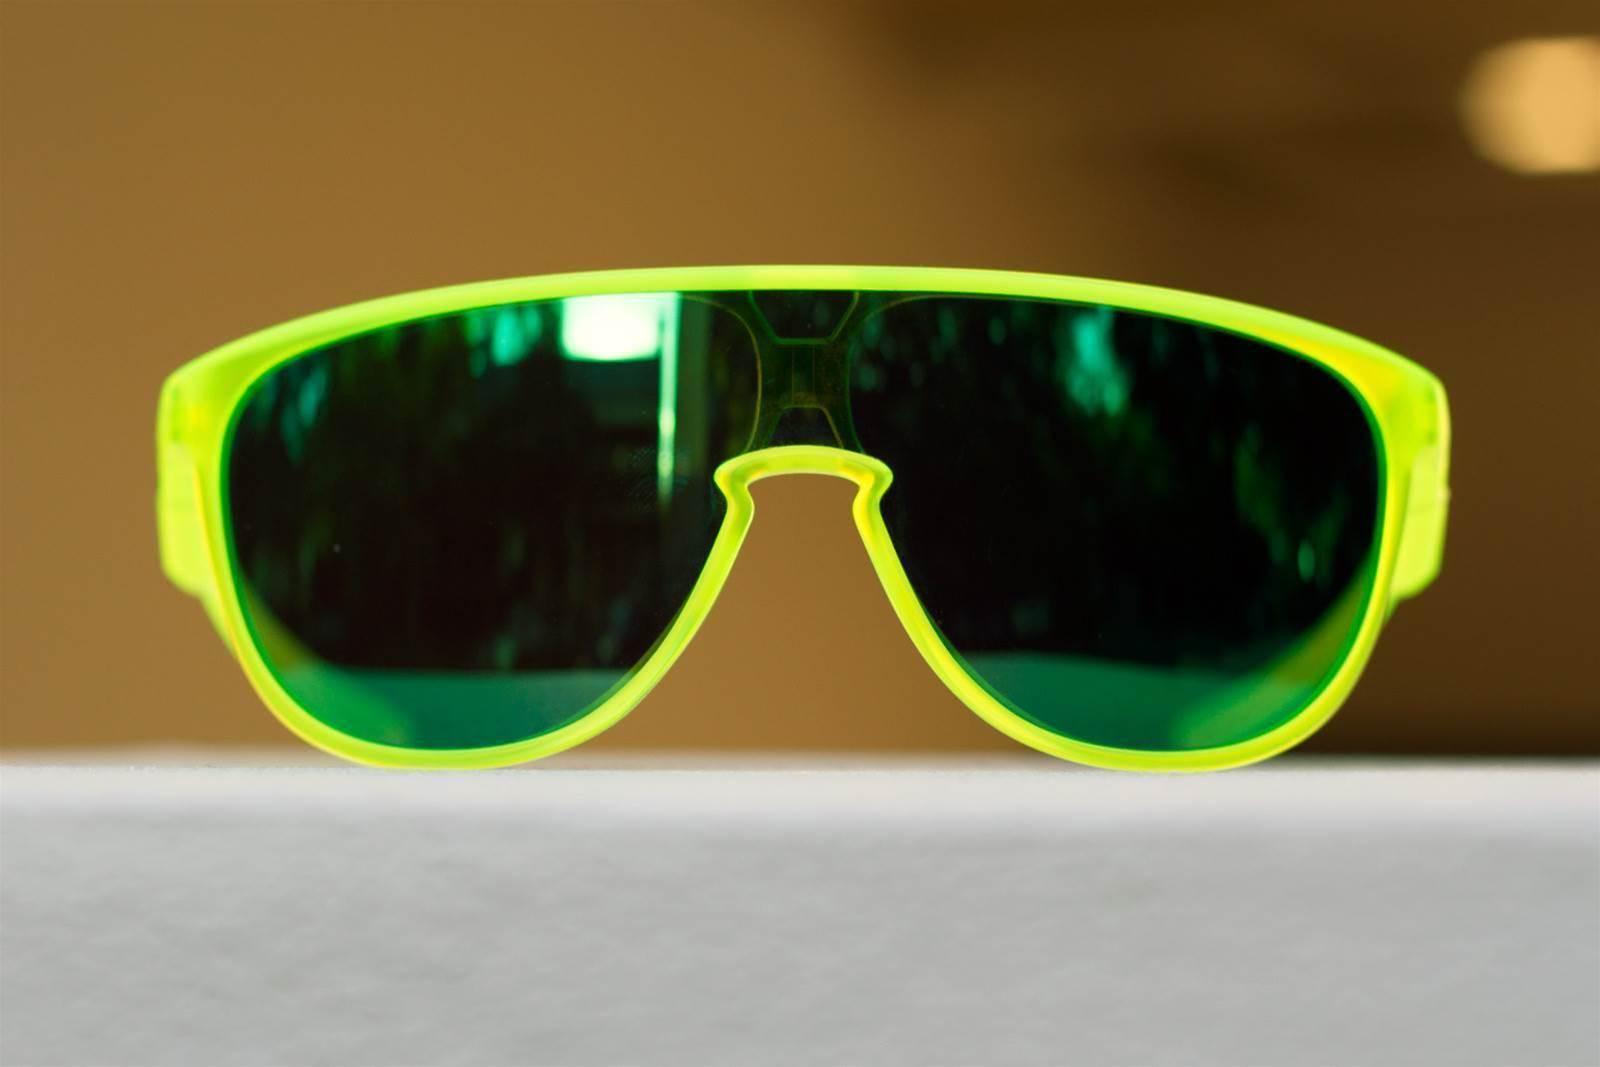 TESTED: Oakley Trillbe sunglasses